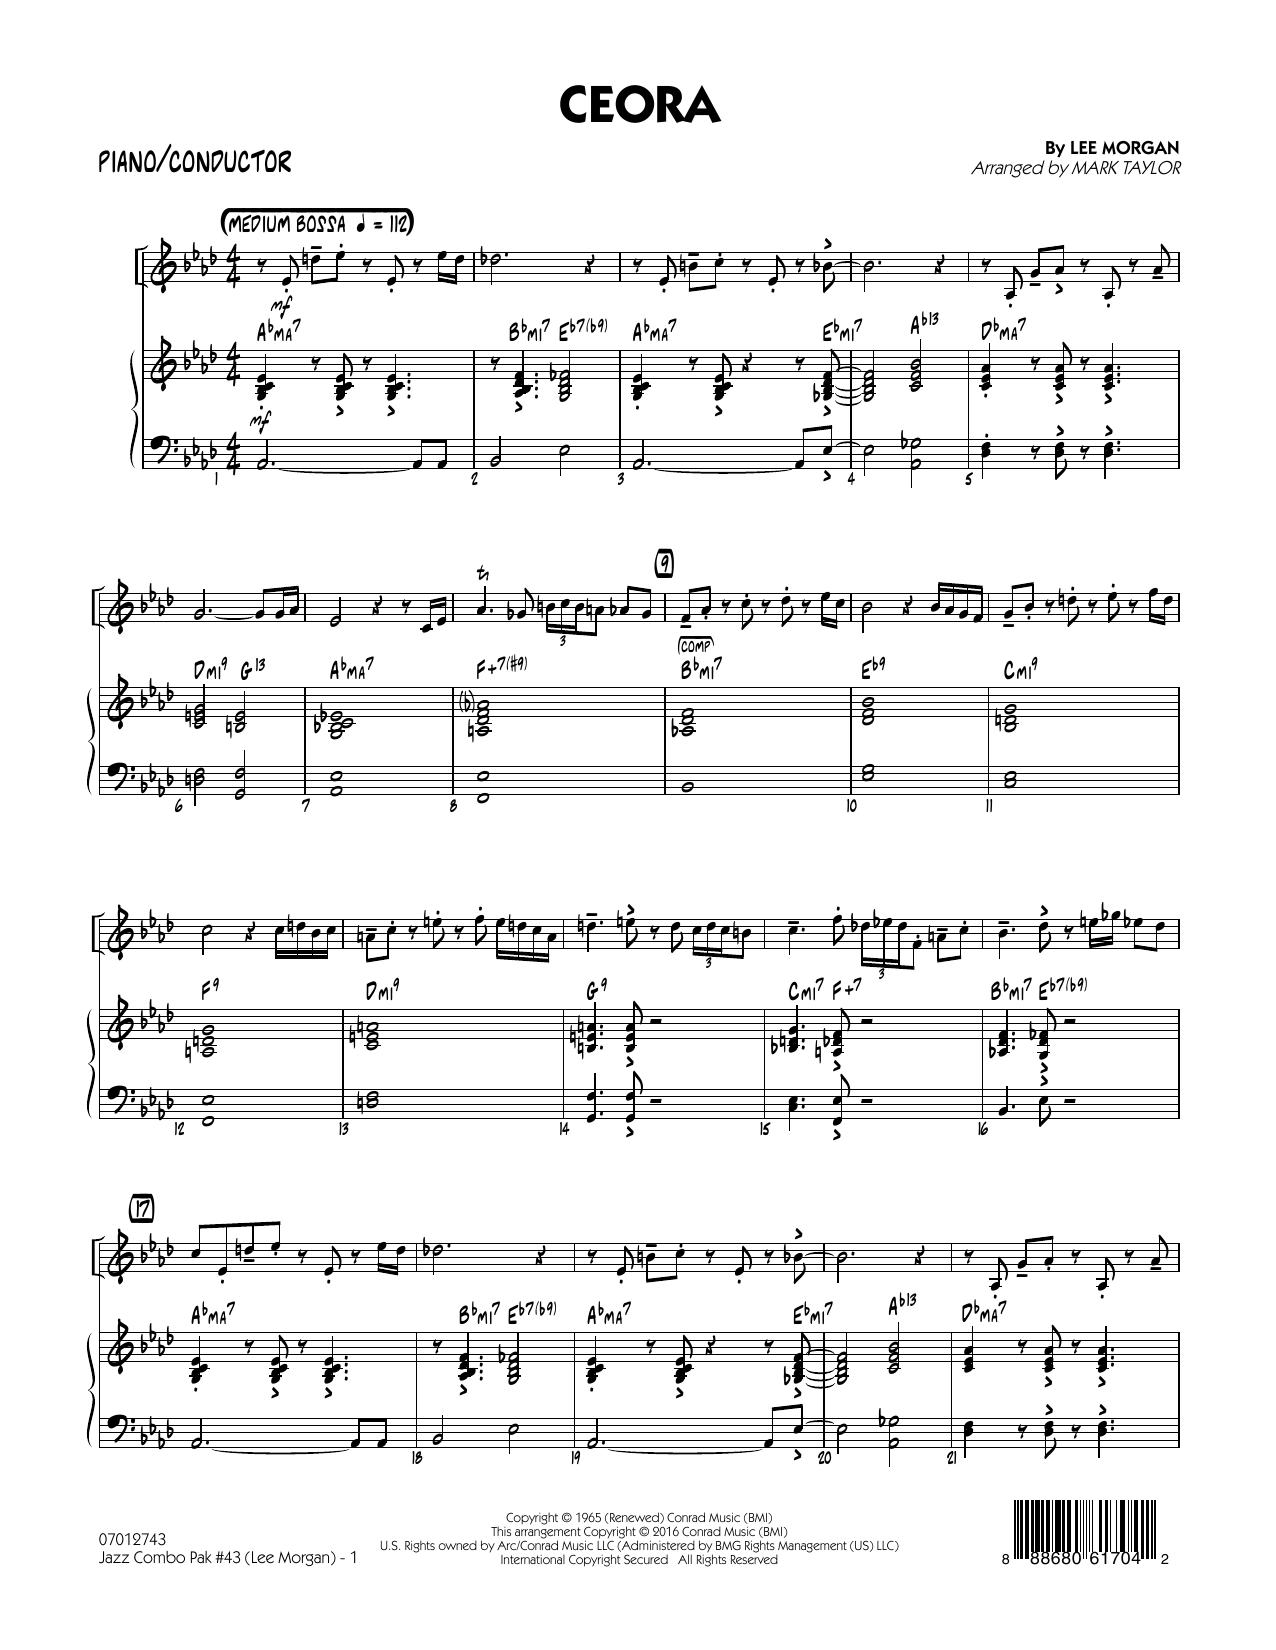 Jazz Combo Pak #43 (Lee Morgan) - Piano/Conductor (Jazz Ensemble)